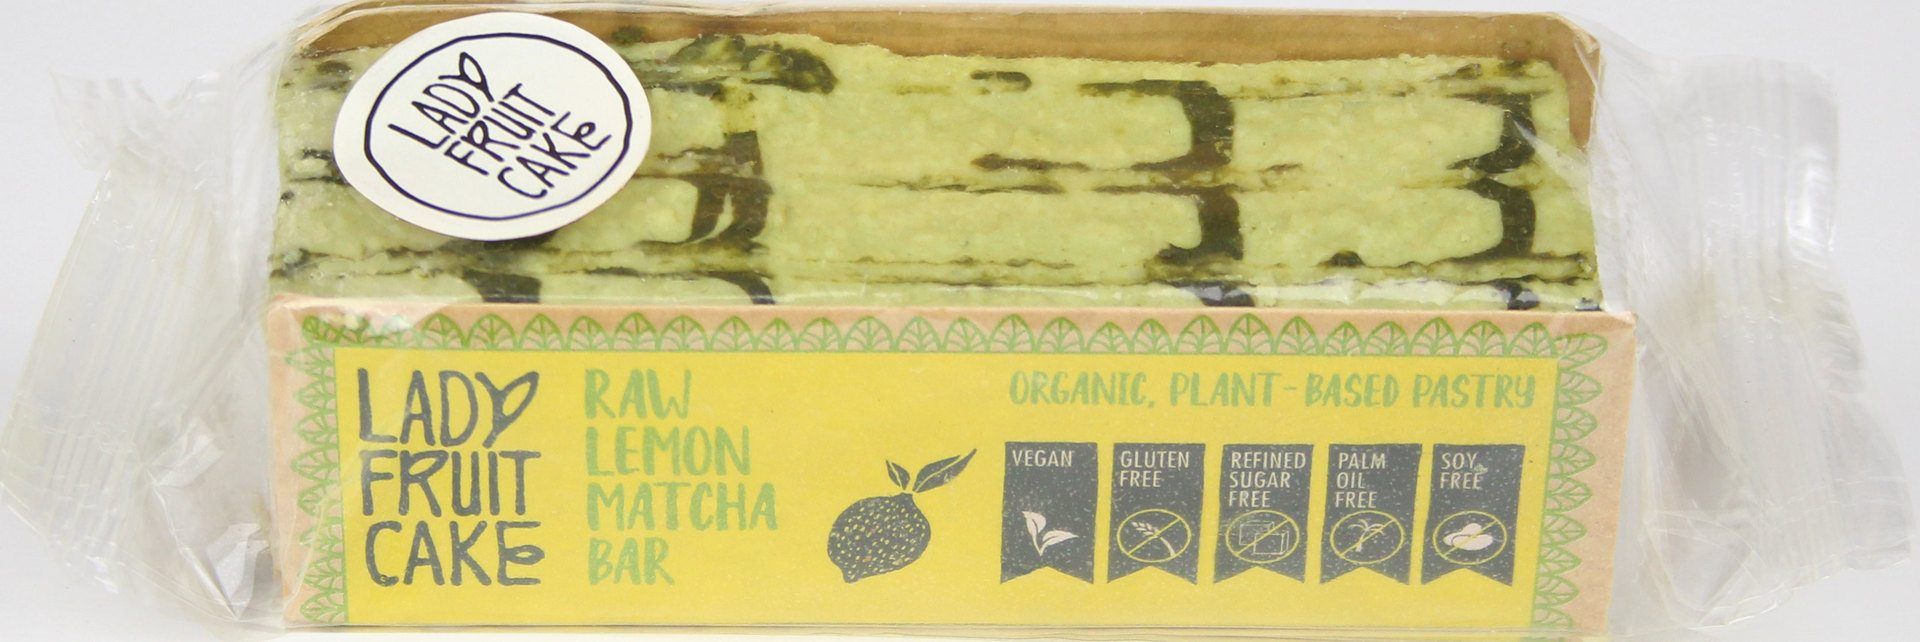 Biologische LadyFruitCake RAW citroen/matcha bar 70 gr